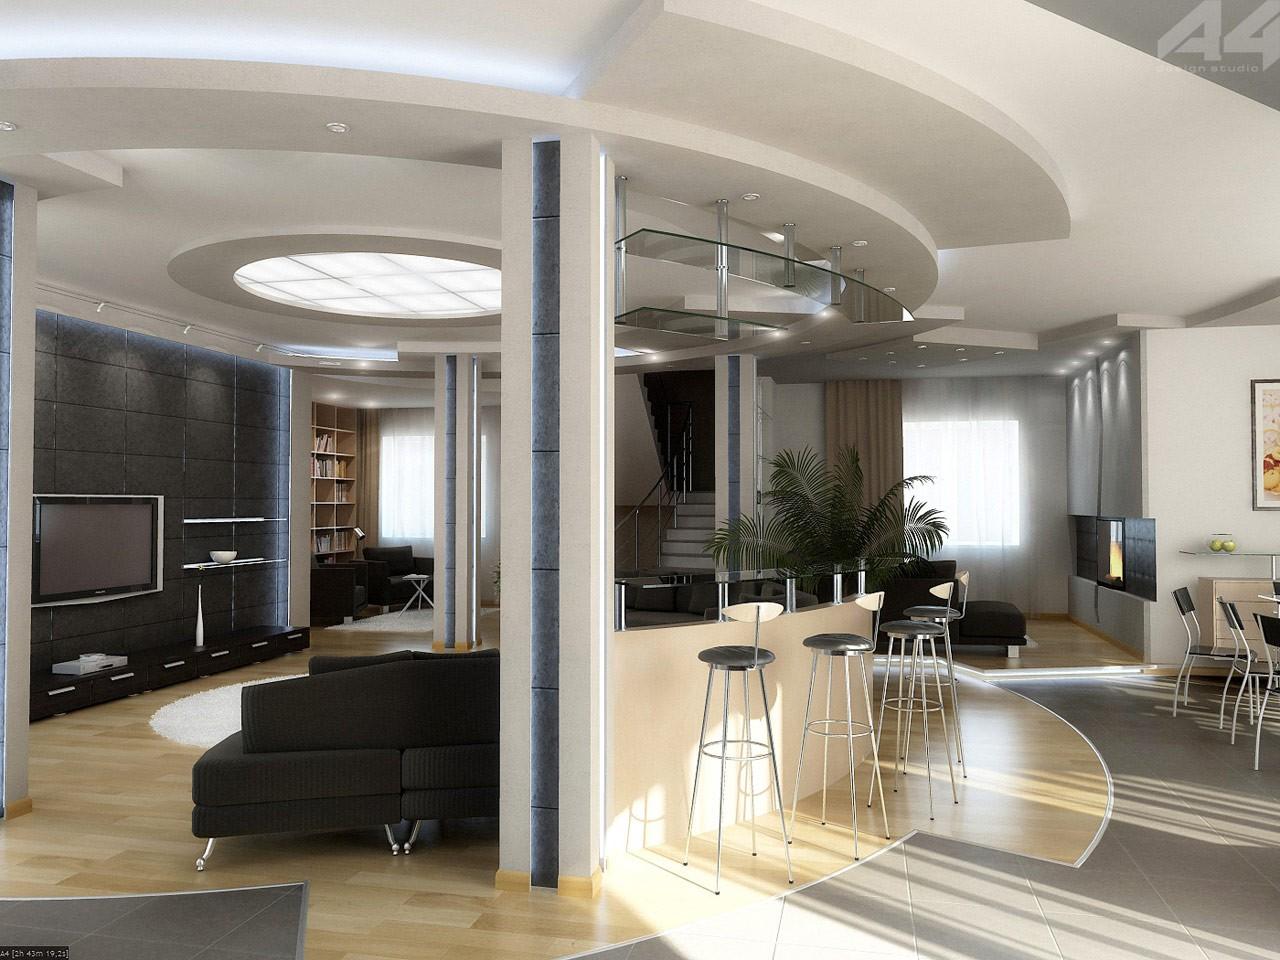 Sfondi camera interior design tenuta atrio pavimento casa